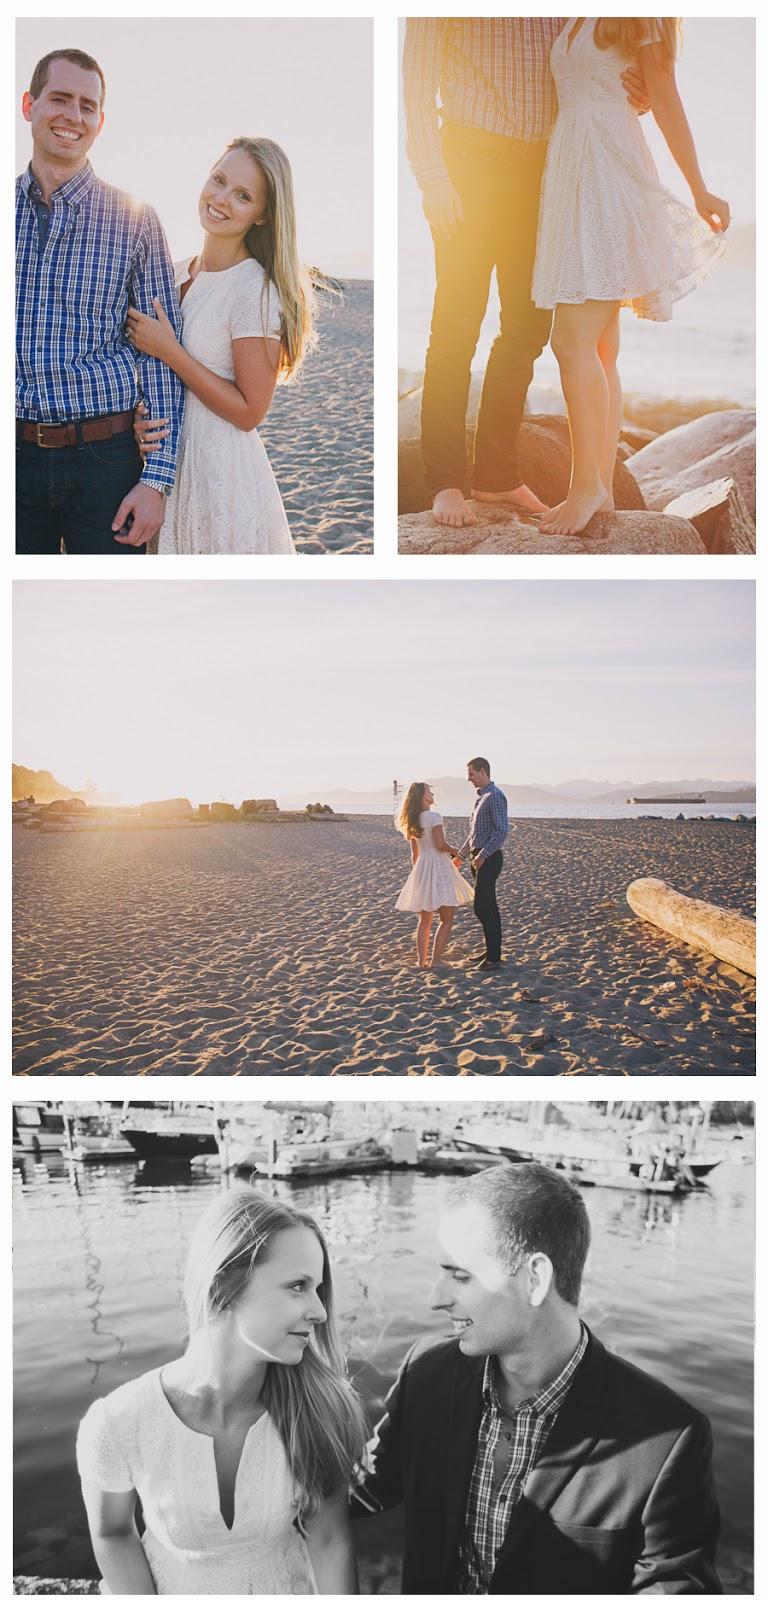 Vancouver engagement photographer jericho beach alternative